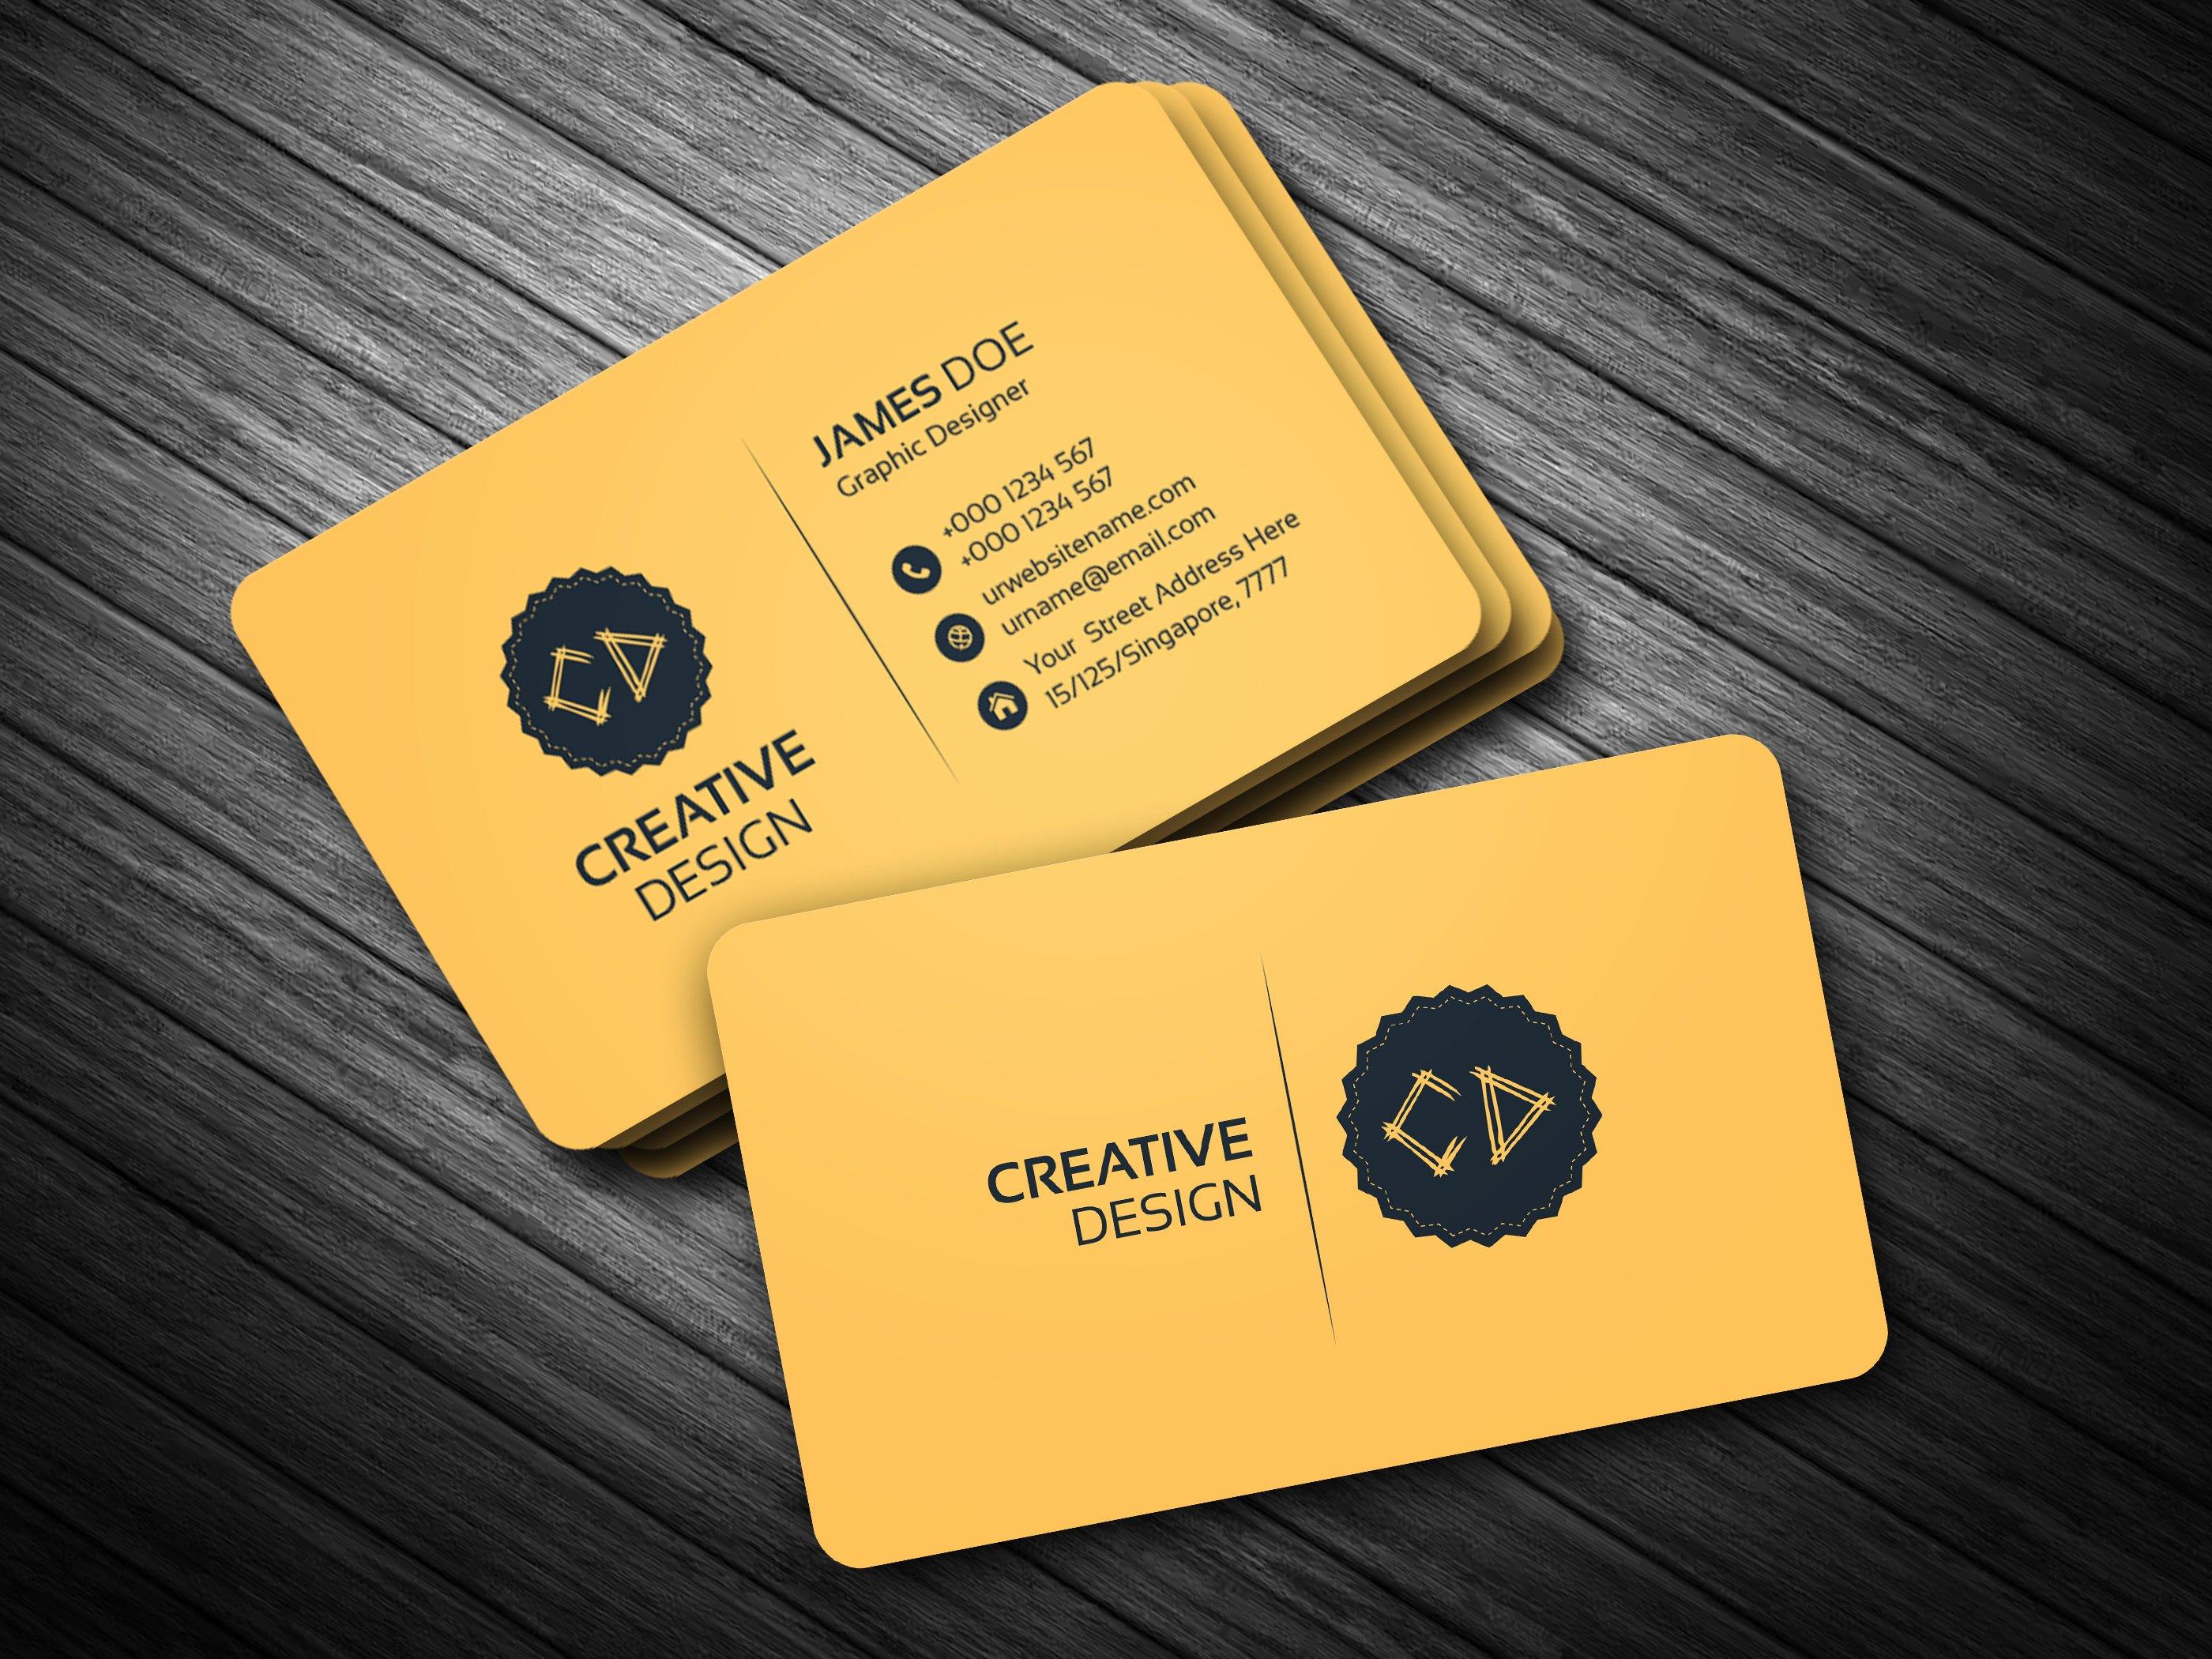 Wakeupnow Business Cards